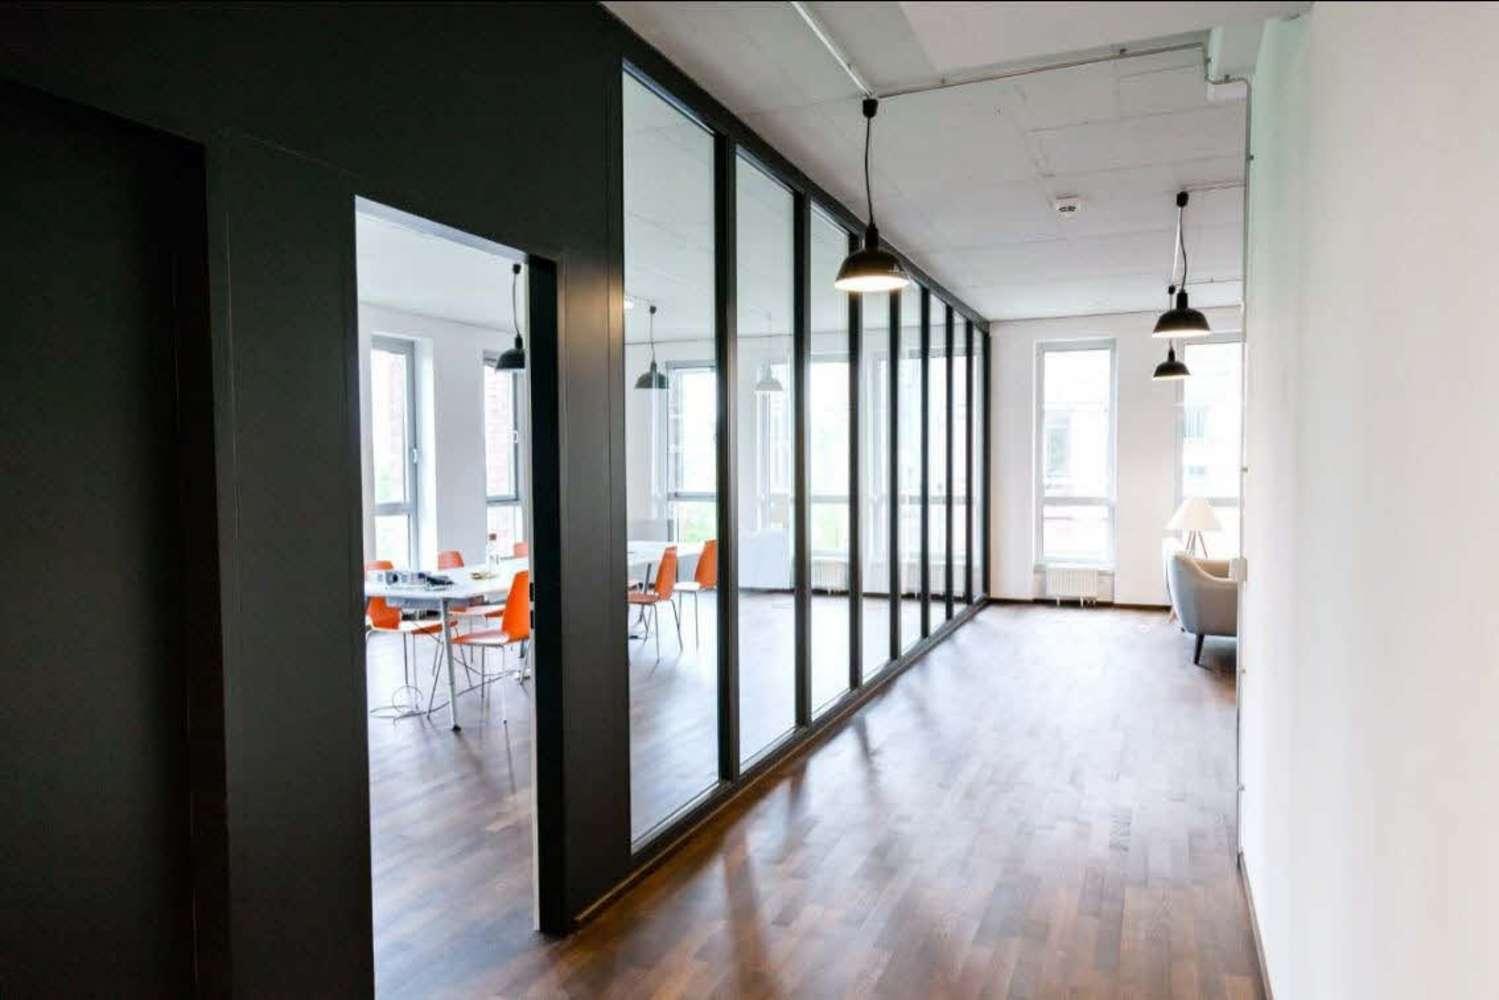 Büros Berlin, 13407 - Büro - Berlin, Reinickendorf - B0145 - 9532484